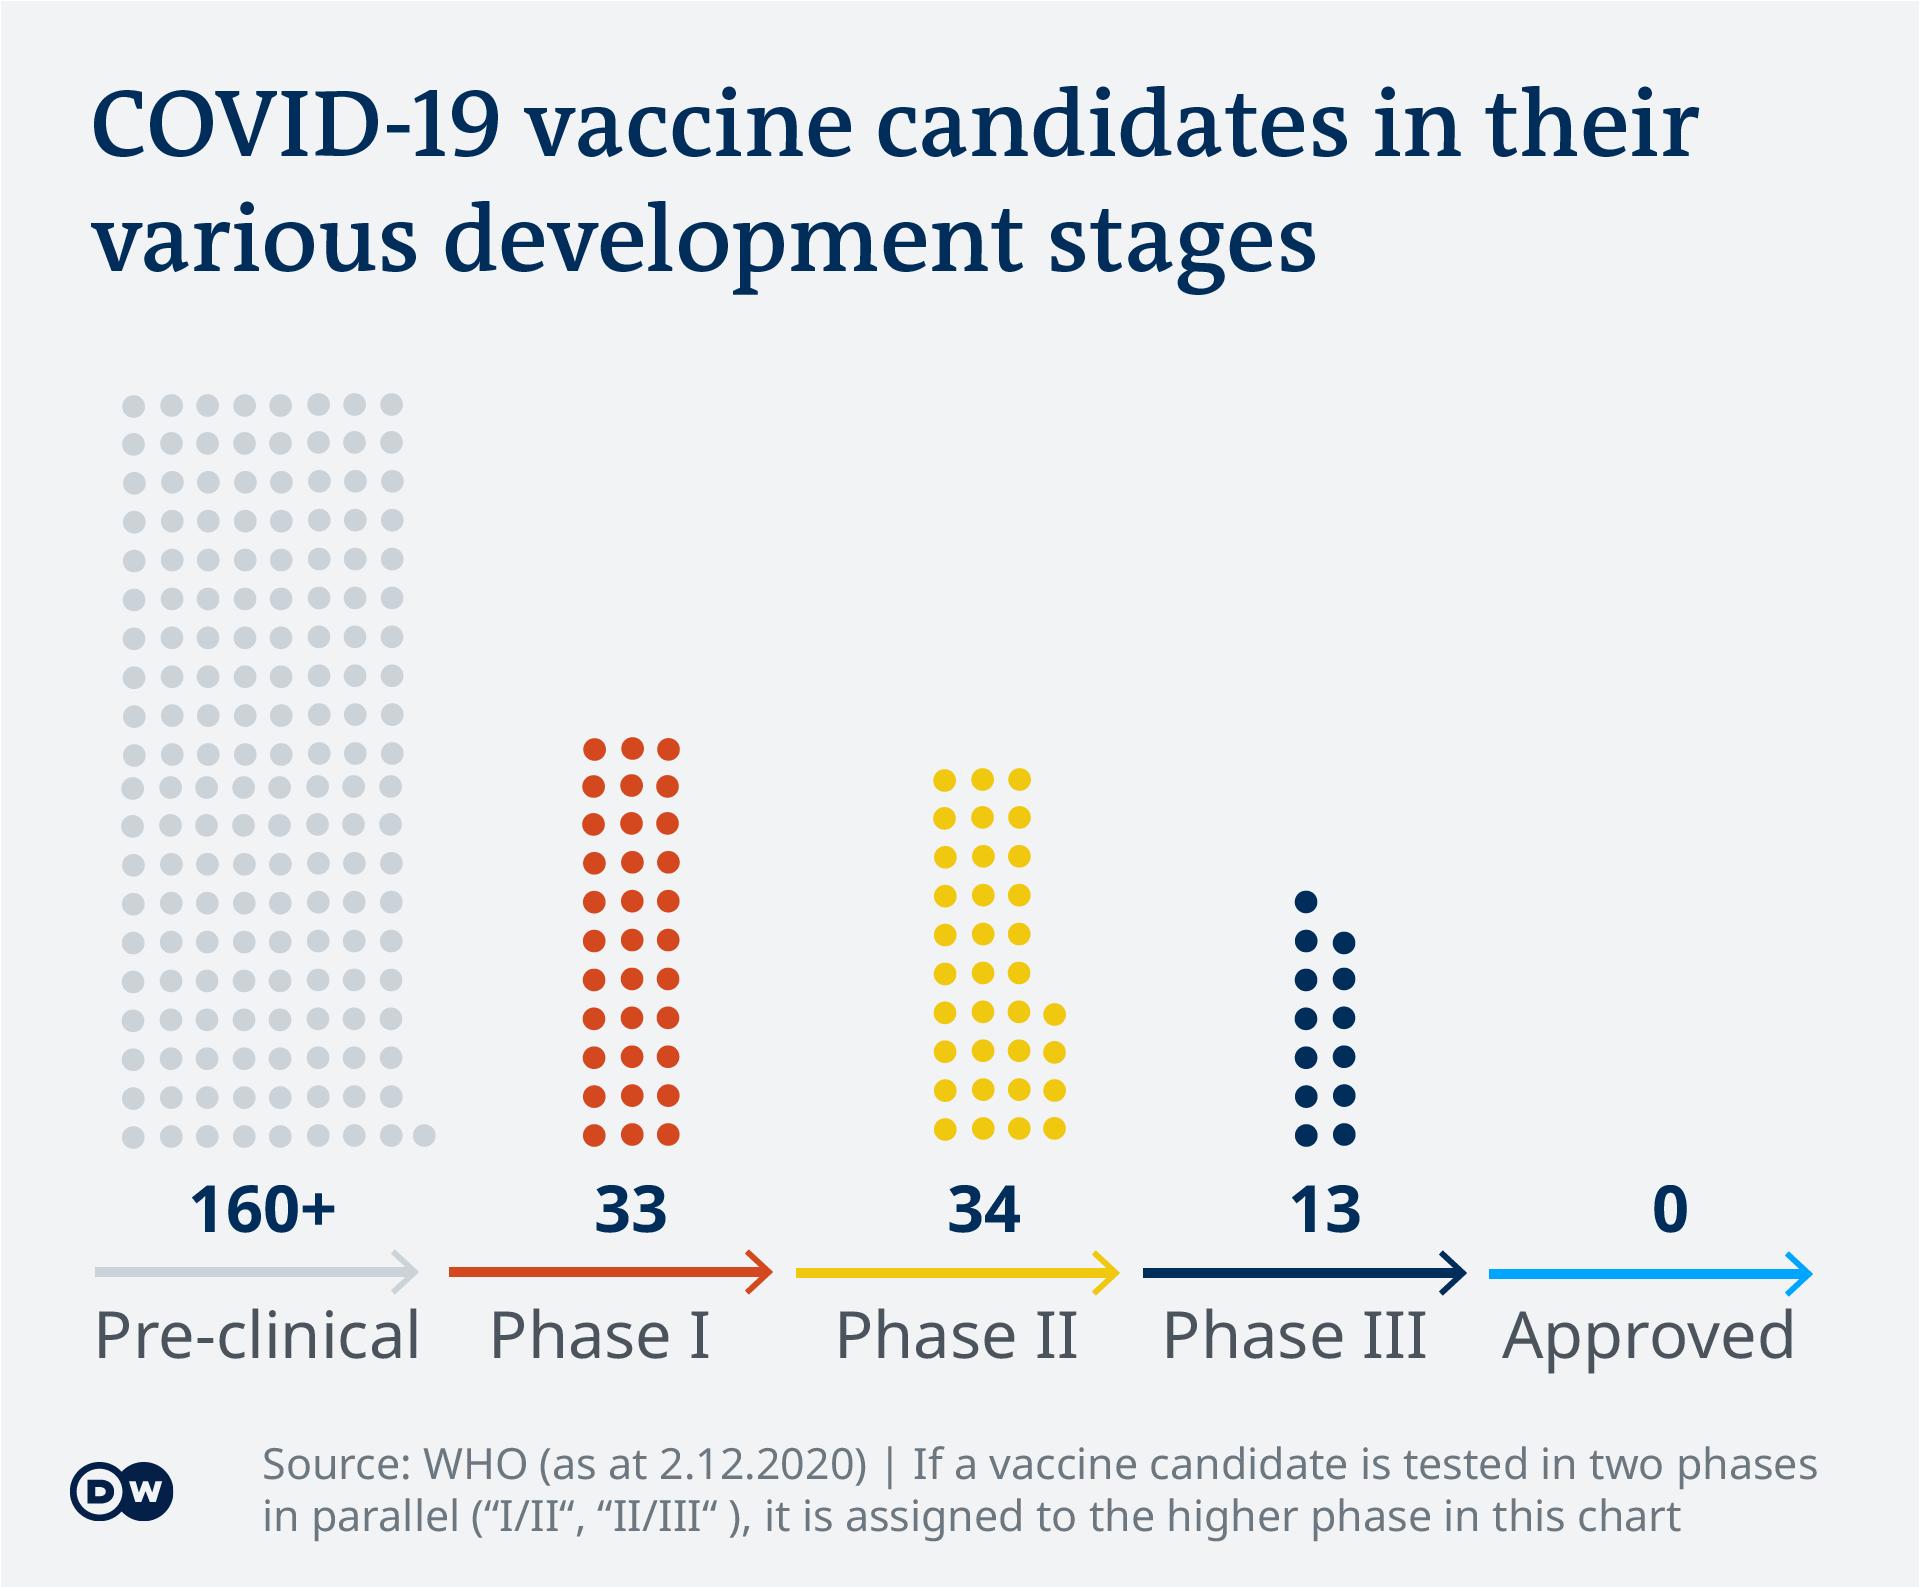 Data visualization - COVID-19 vaccine tracker - Phases - Update 2.12.2020